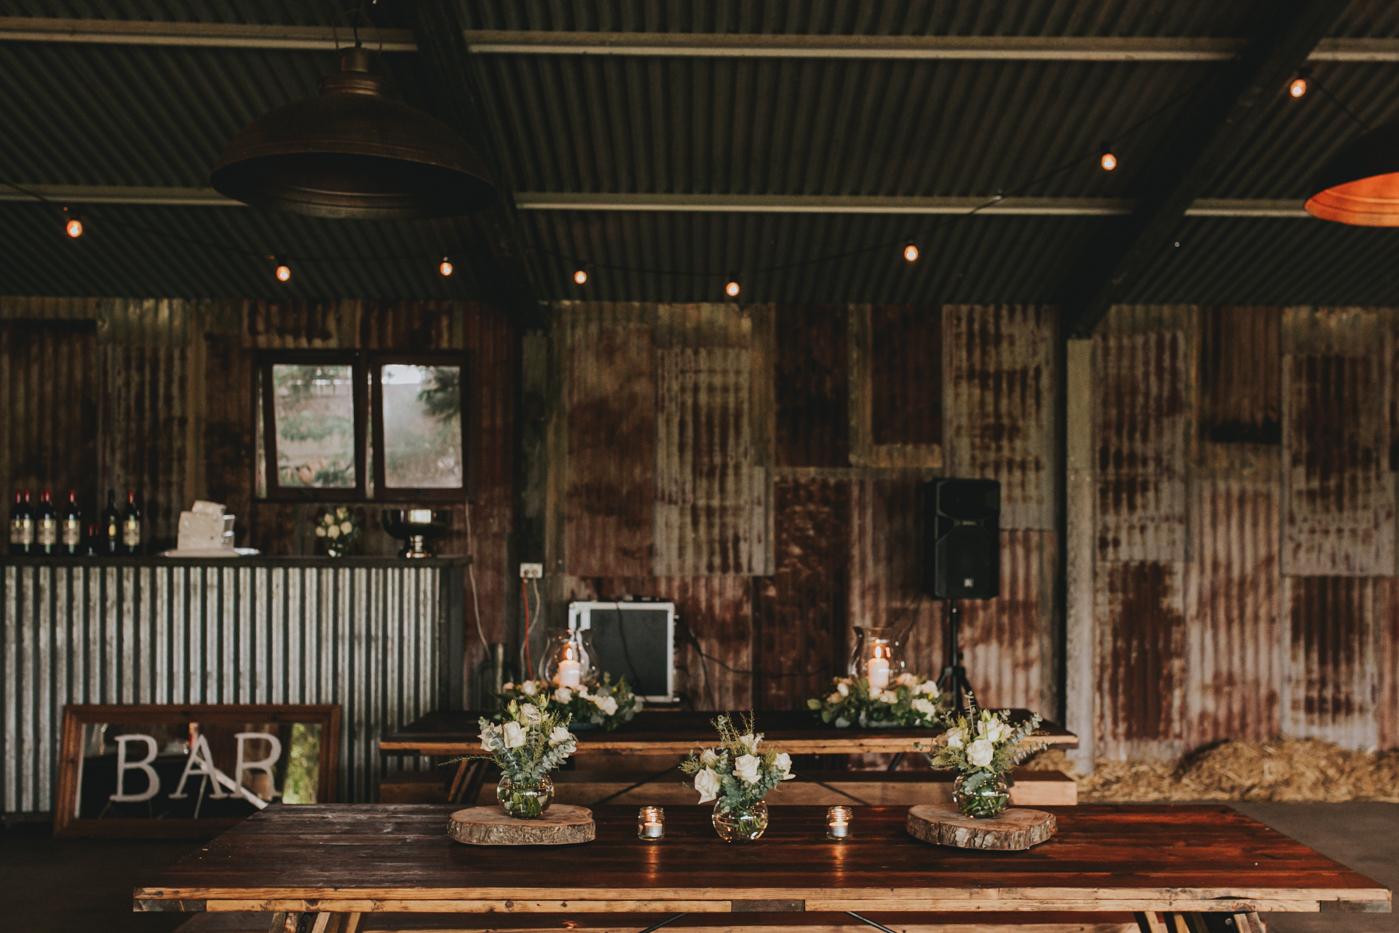 Rachel & Jacob - Willow Farm Berry - South Coast Wedding - Samantha Heather Photography-99.jpg